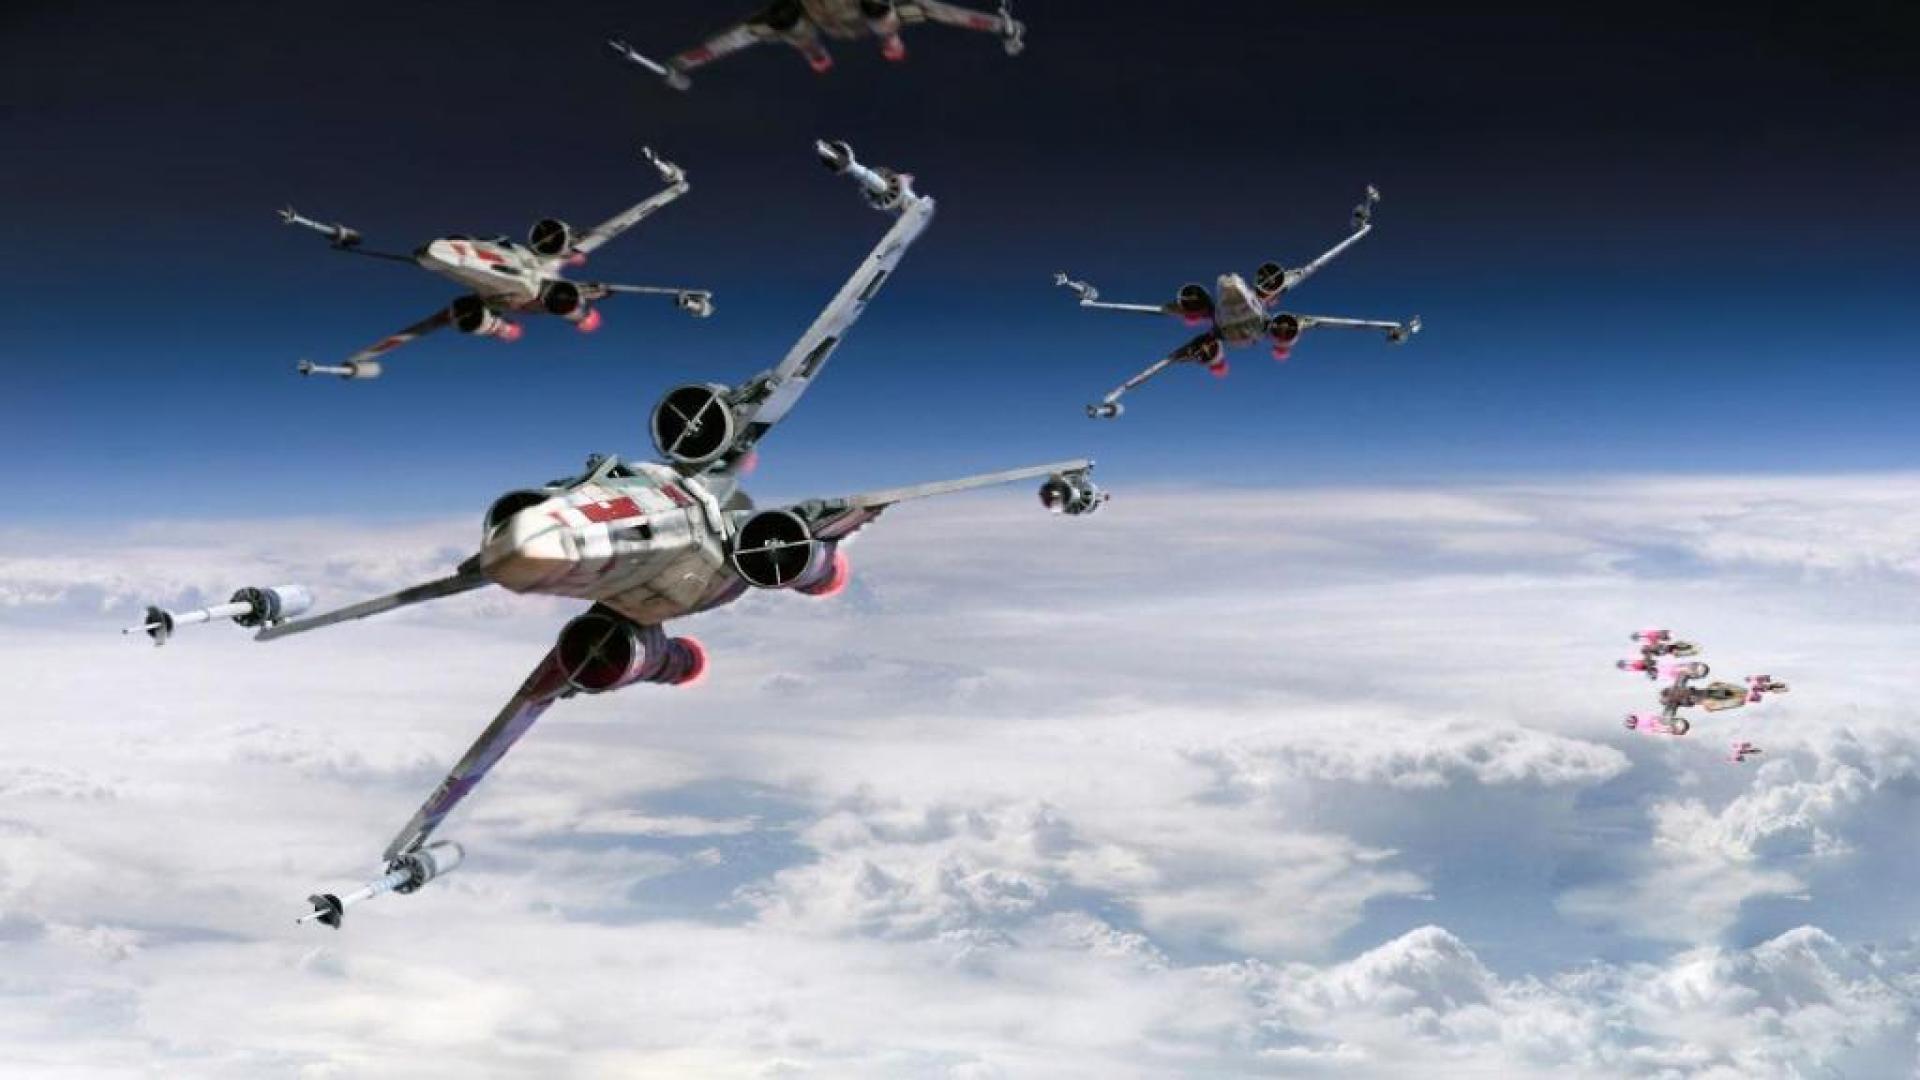 star wars battlefront phone wallpapers